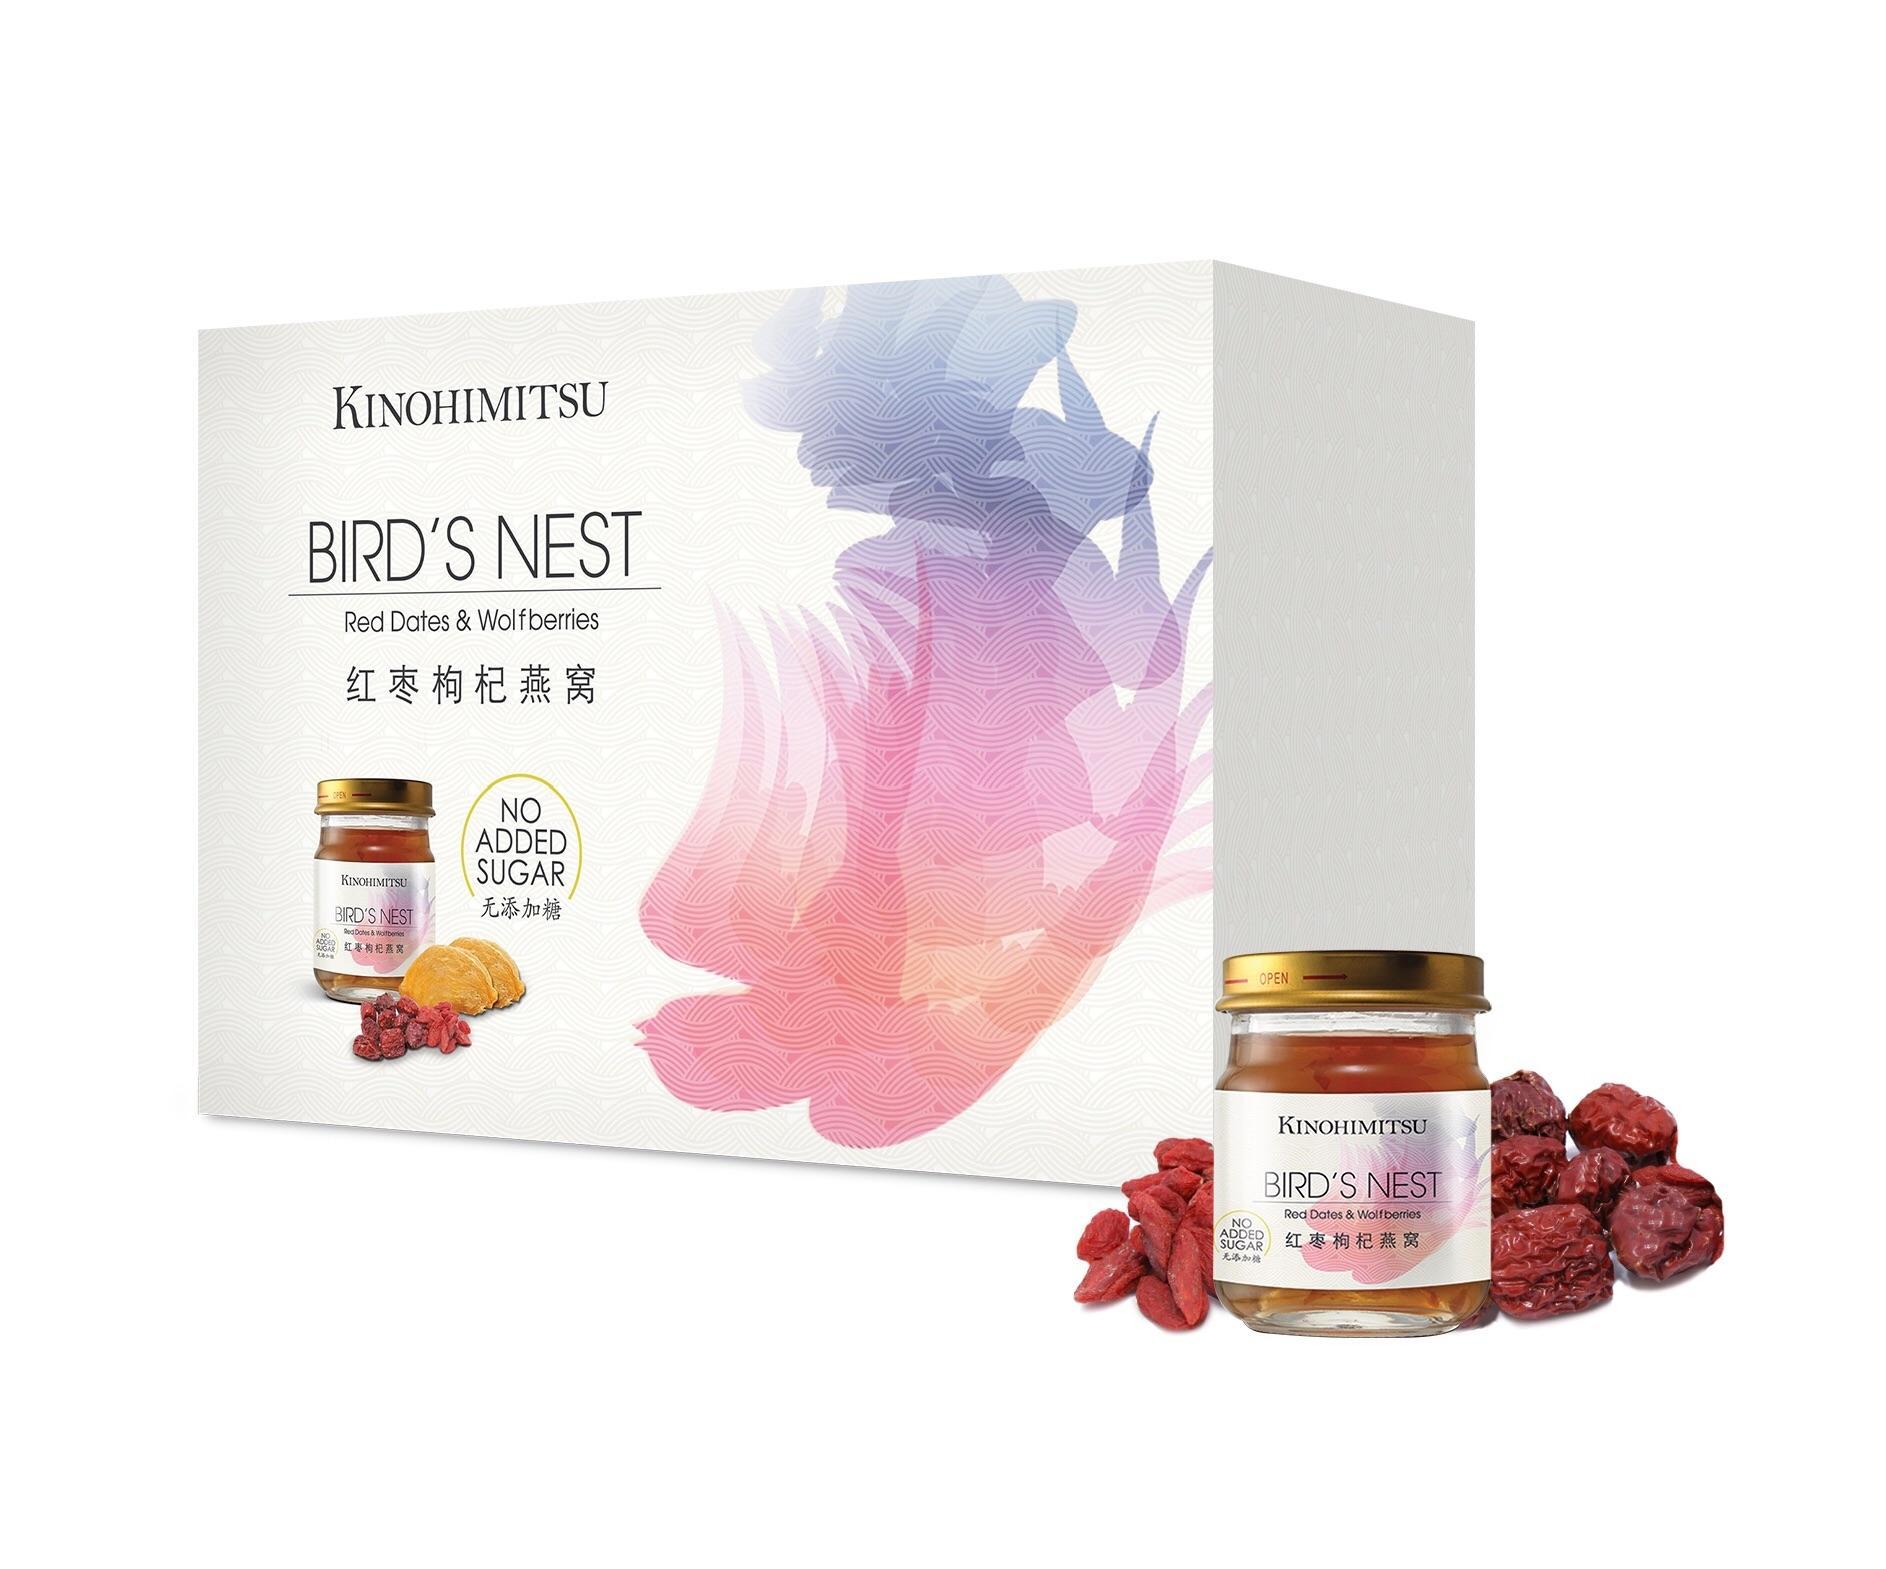 Kinohimitsu Bird's Nest with Red Dates & Wolfberries 6s